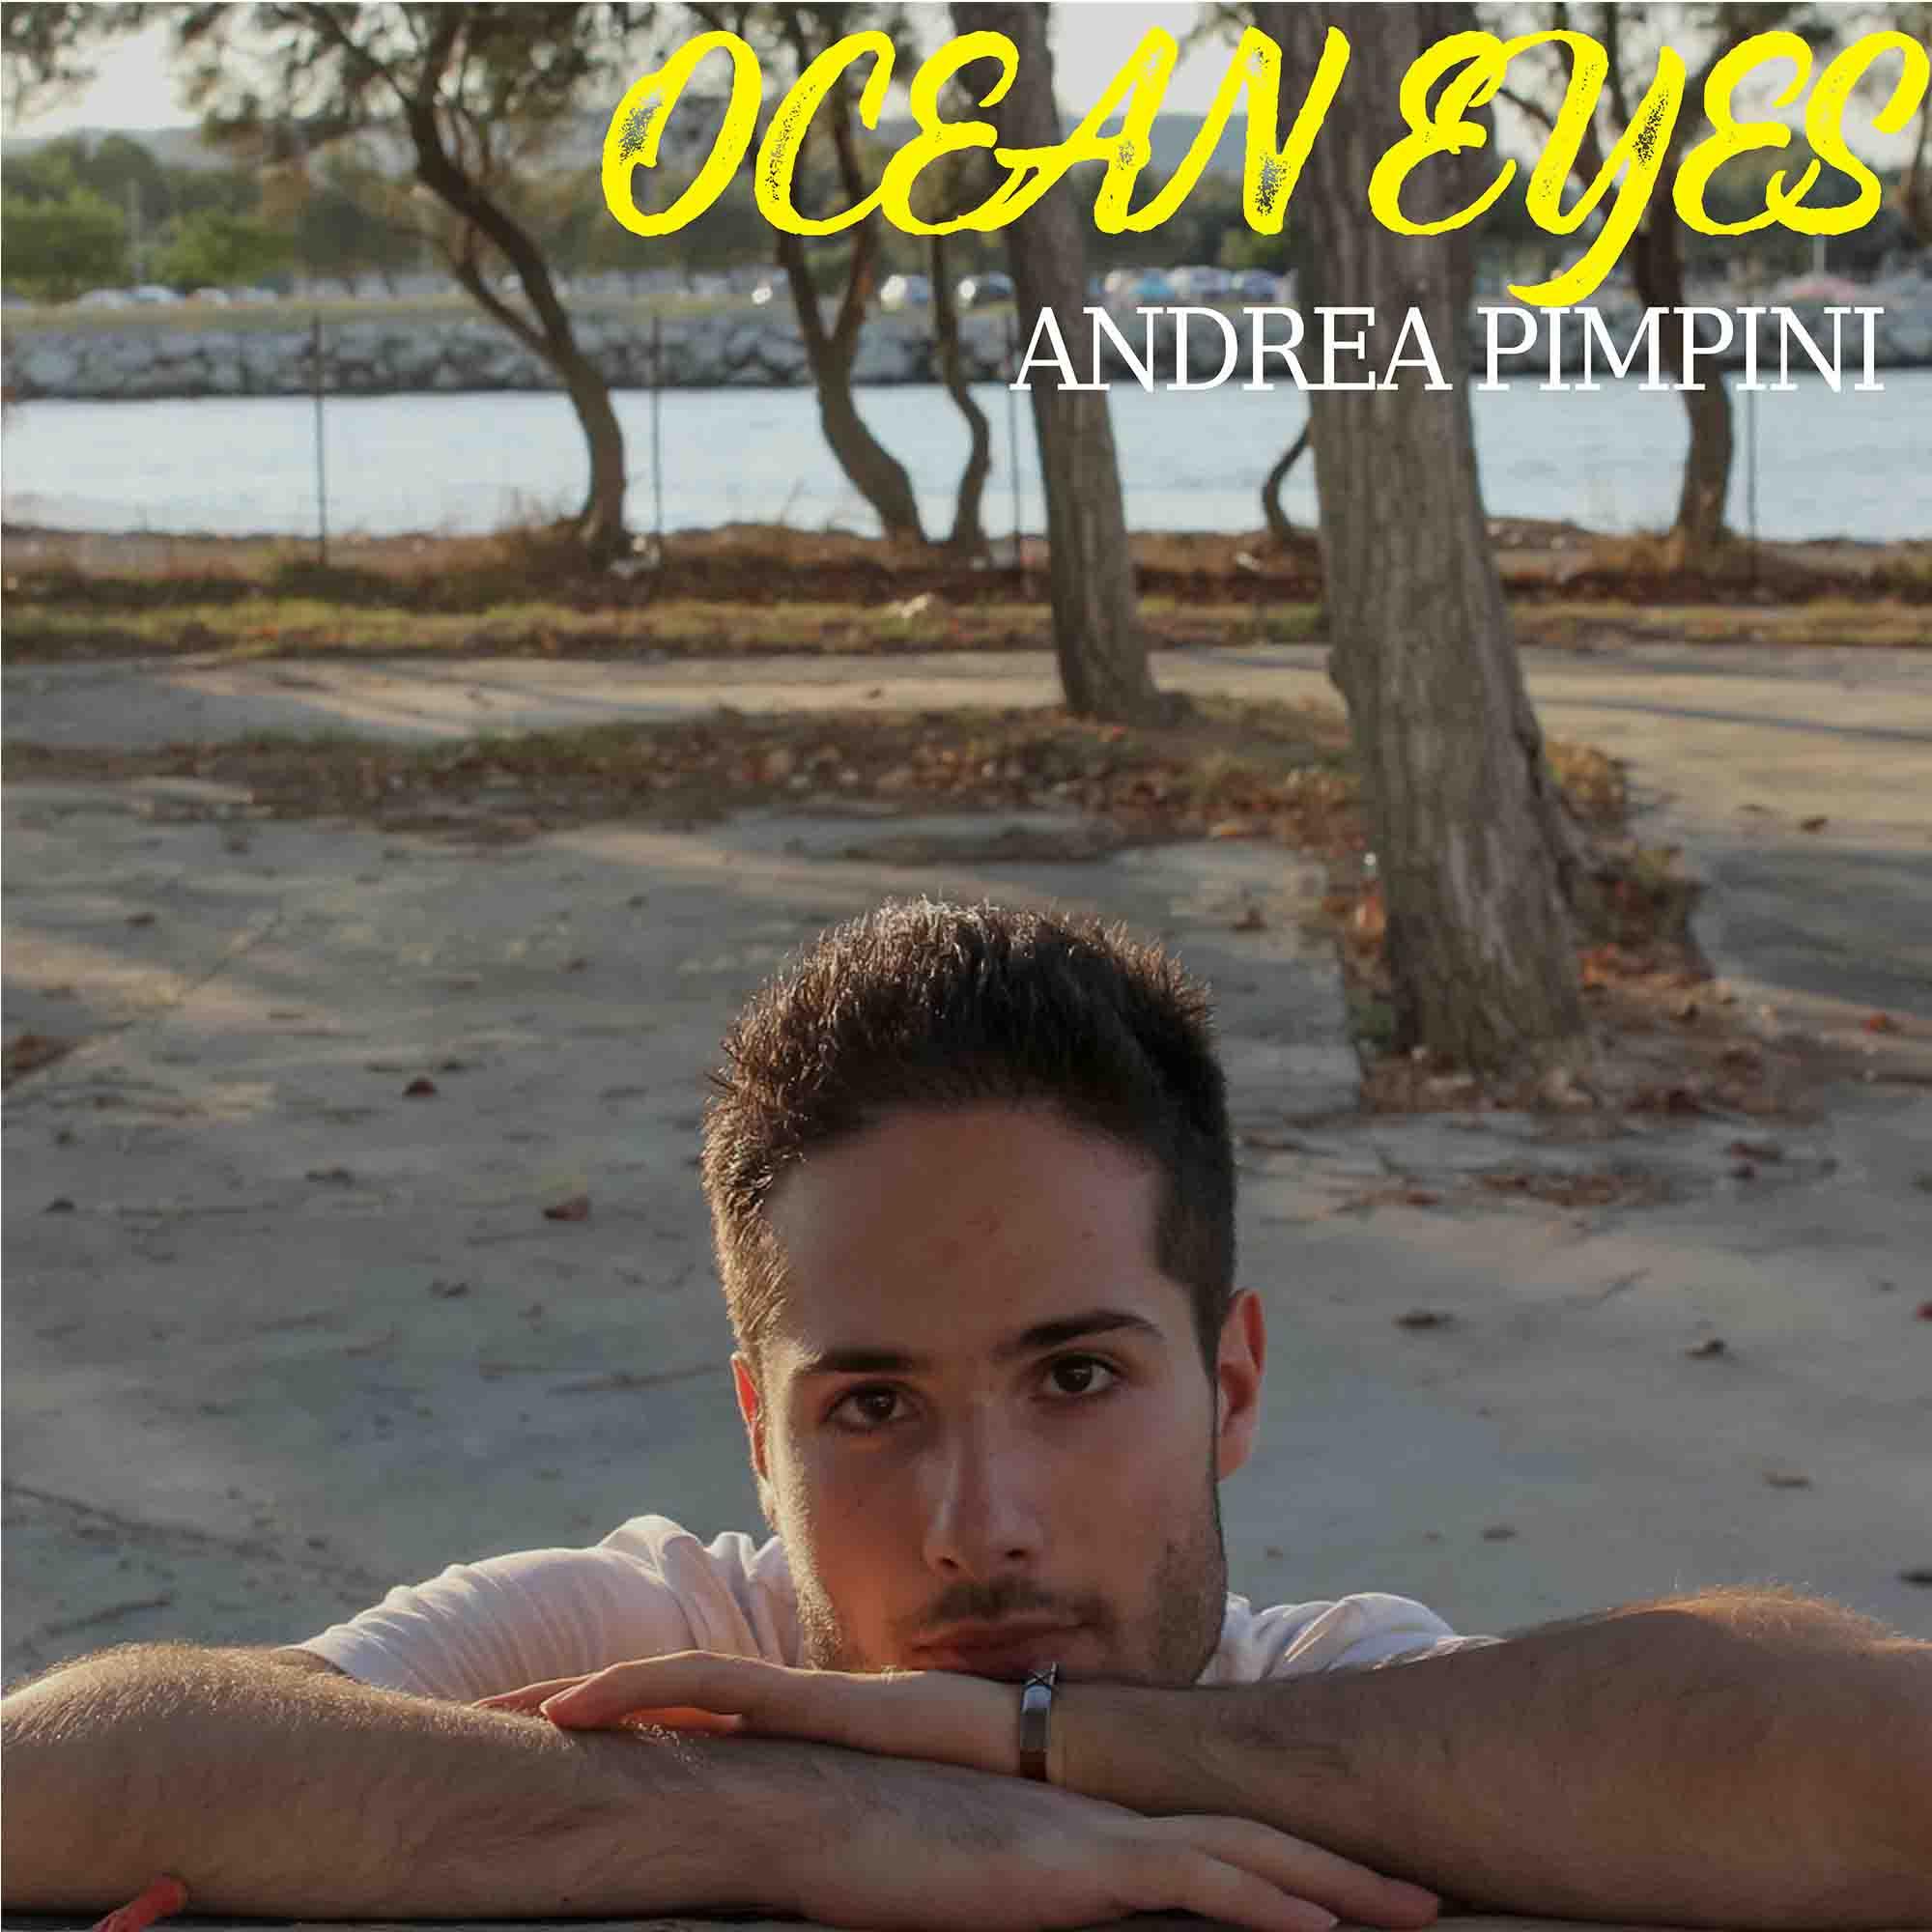 "Esce oggi ""Ocean Eyes"" di Andrea Pimpini"